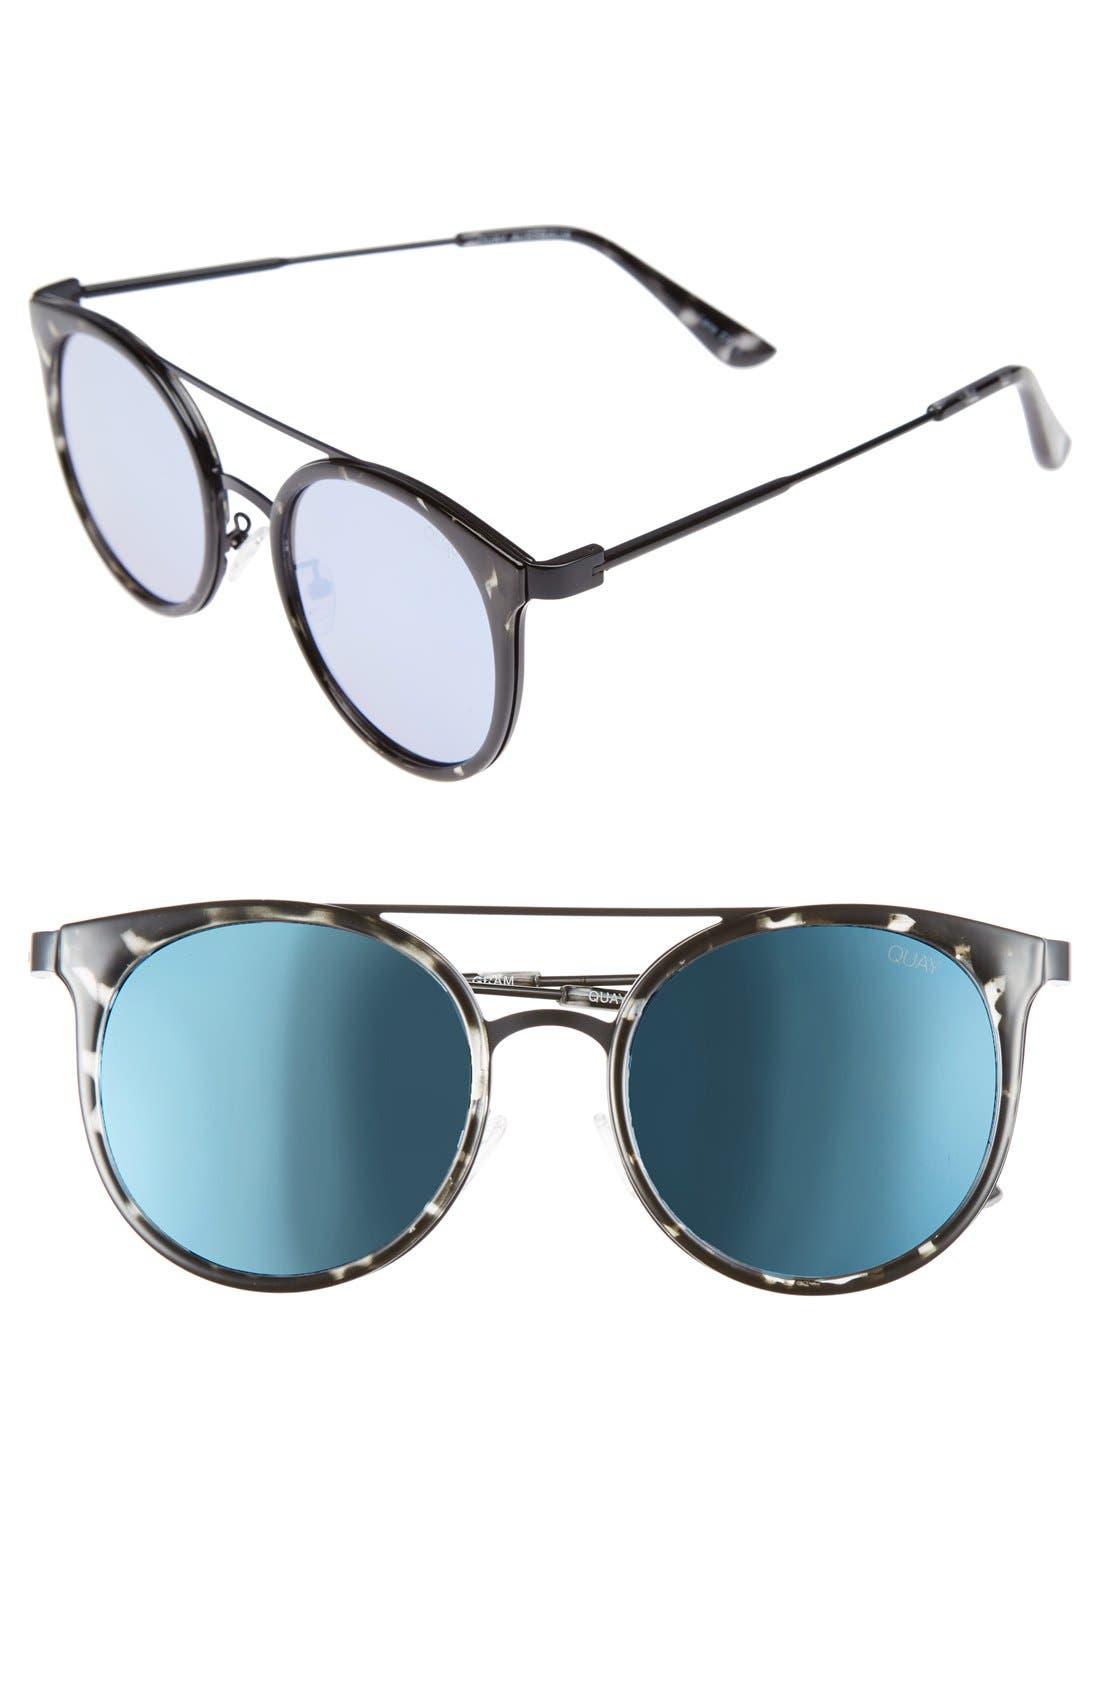 Kandy Gram 51mm Round Sunglasses,                             Main thumbnail 2, color,